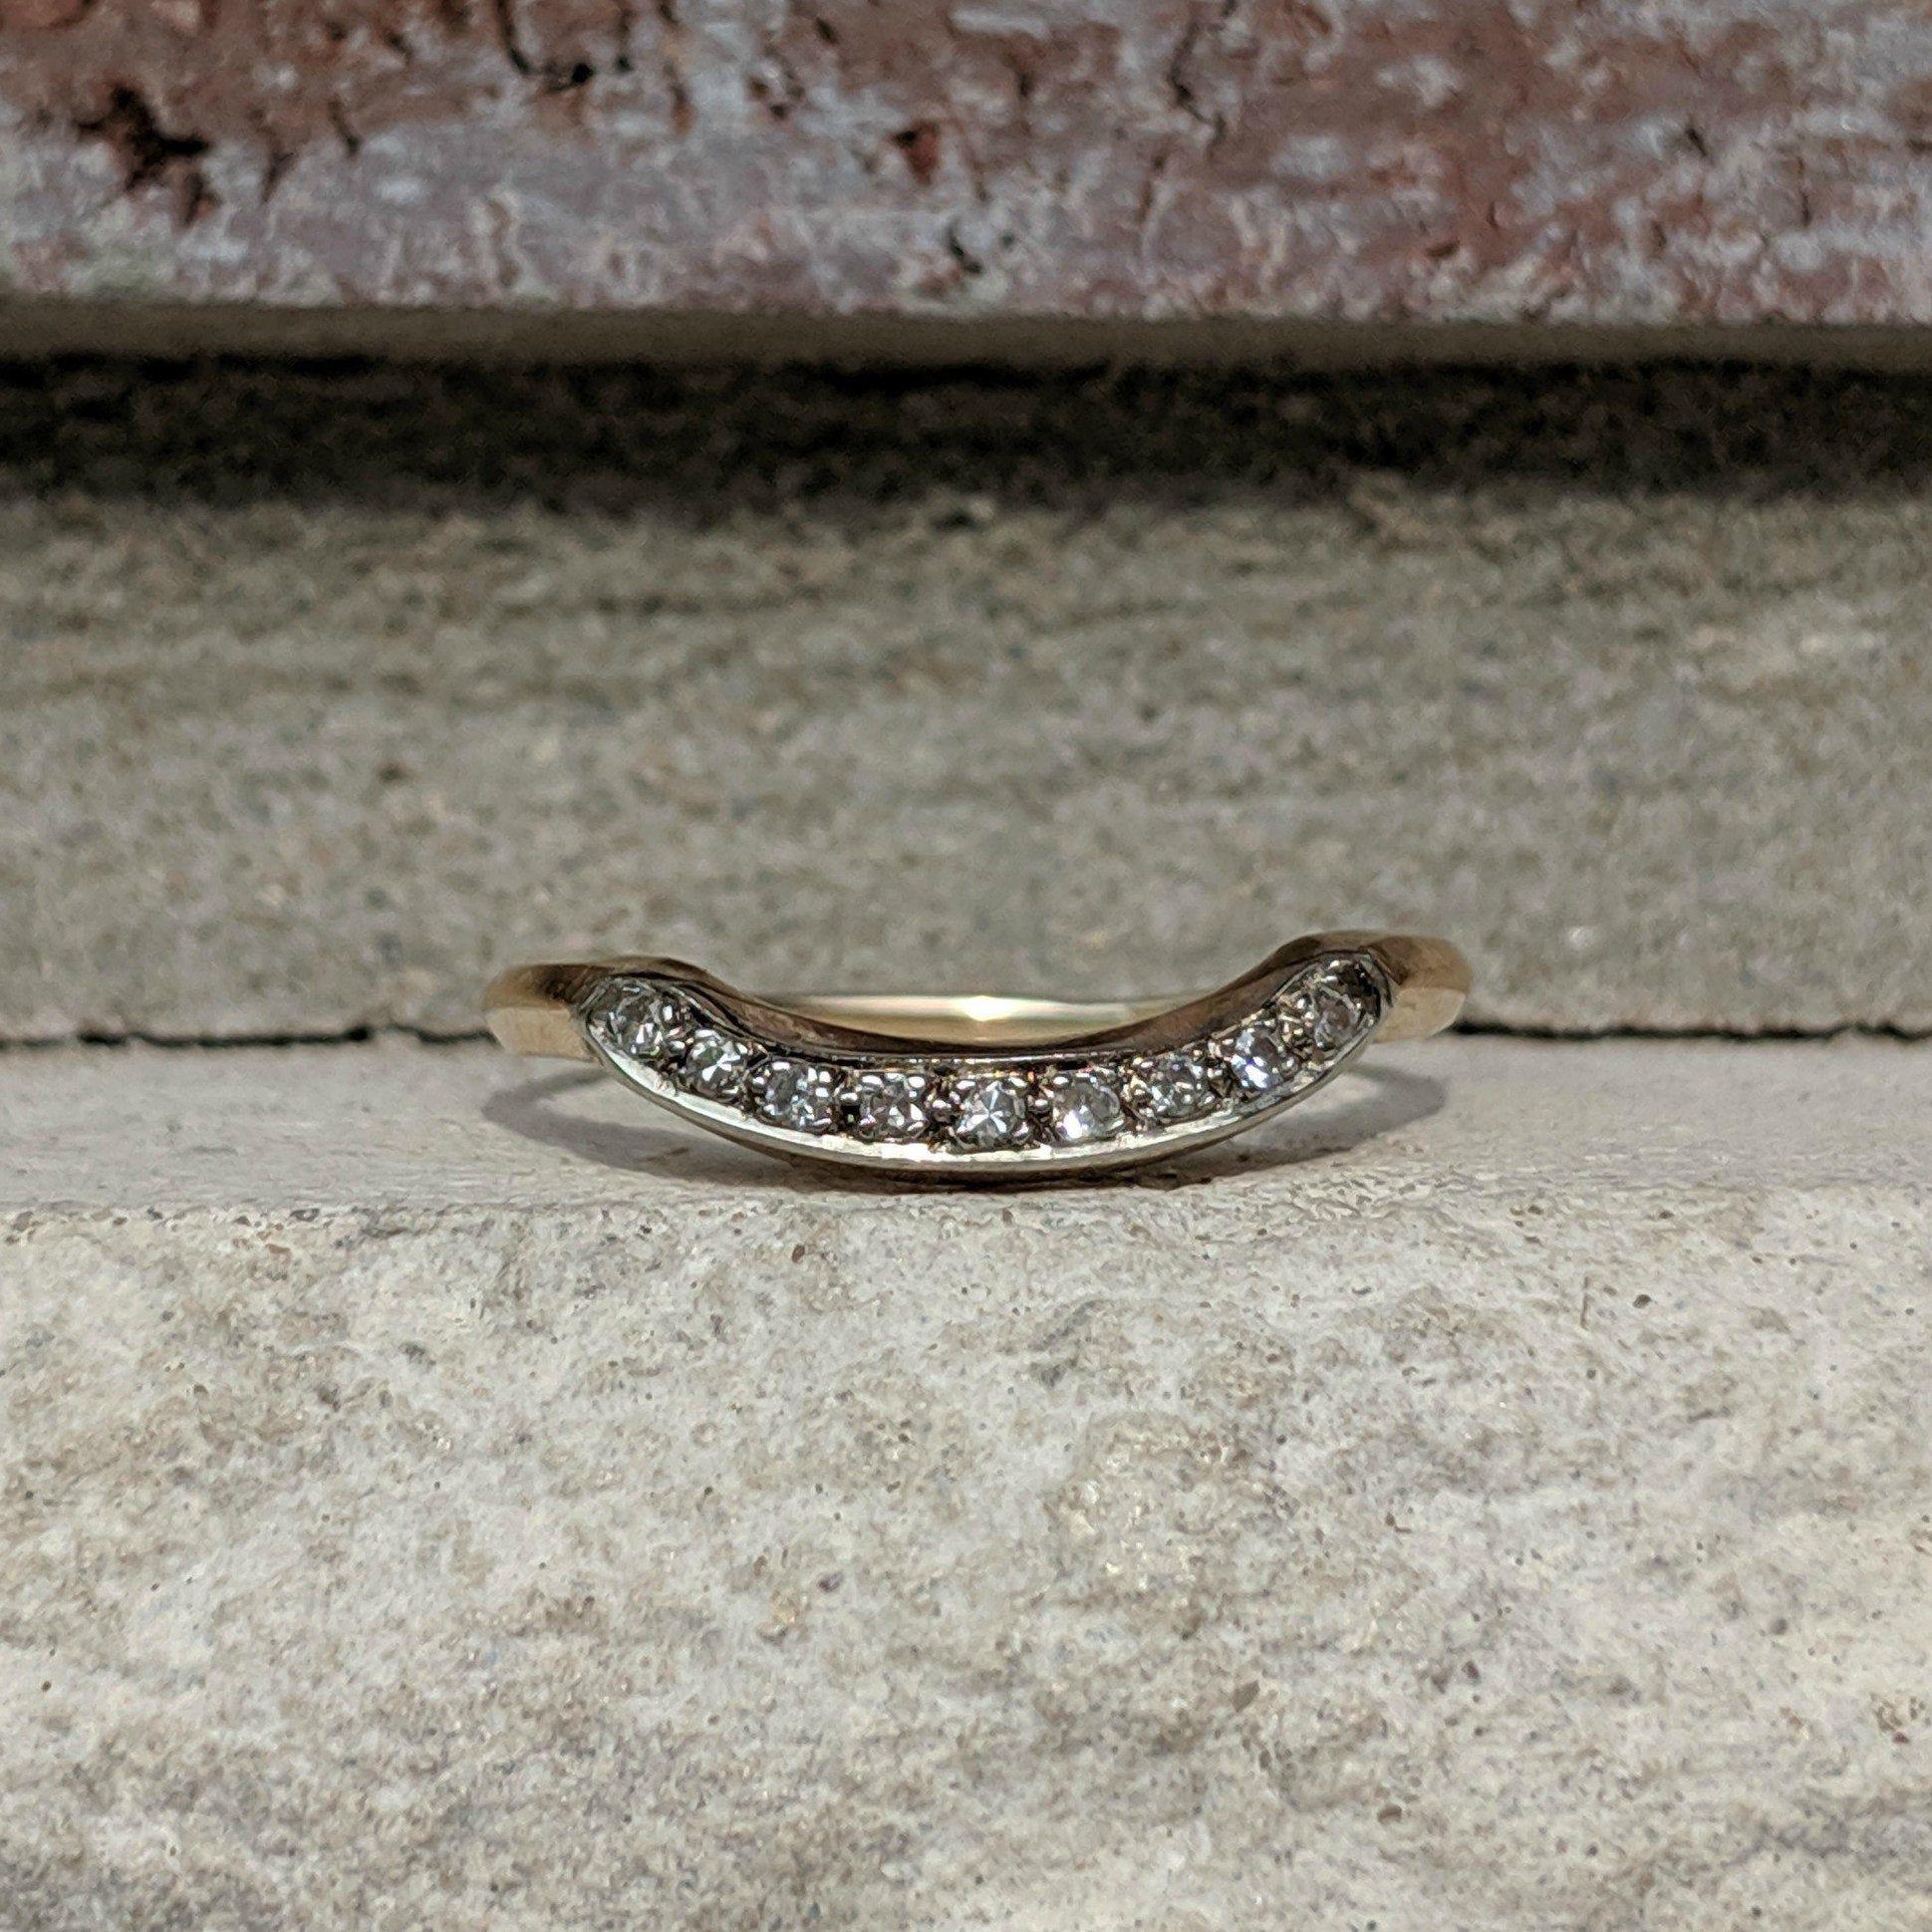 Vintage Curved Contoured Wedding Band Ring Antique